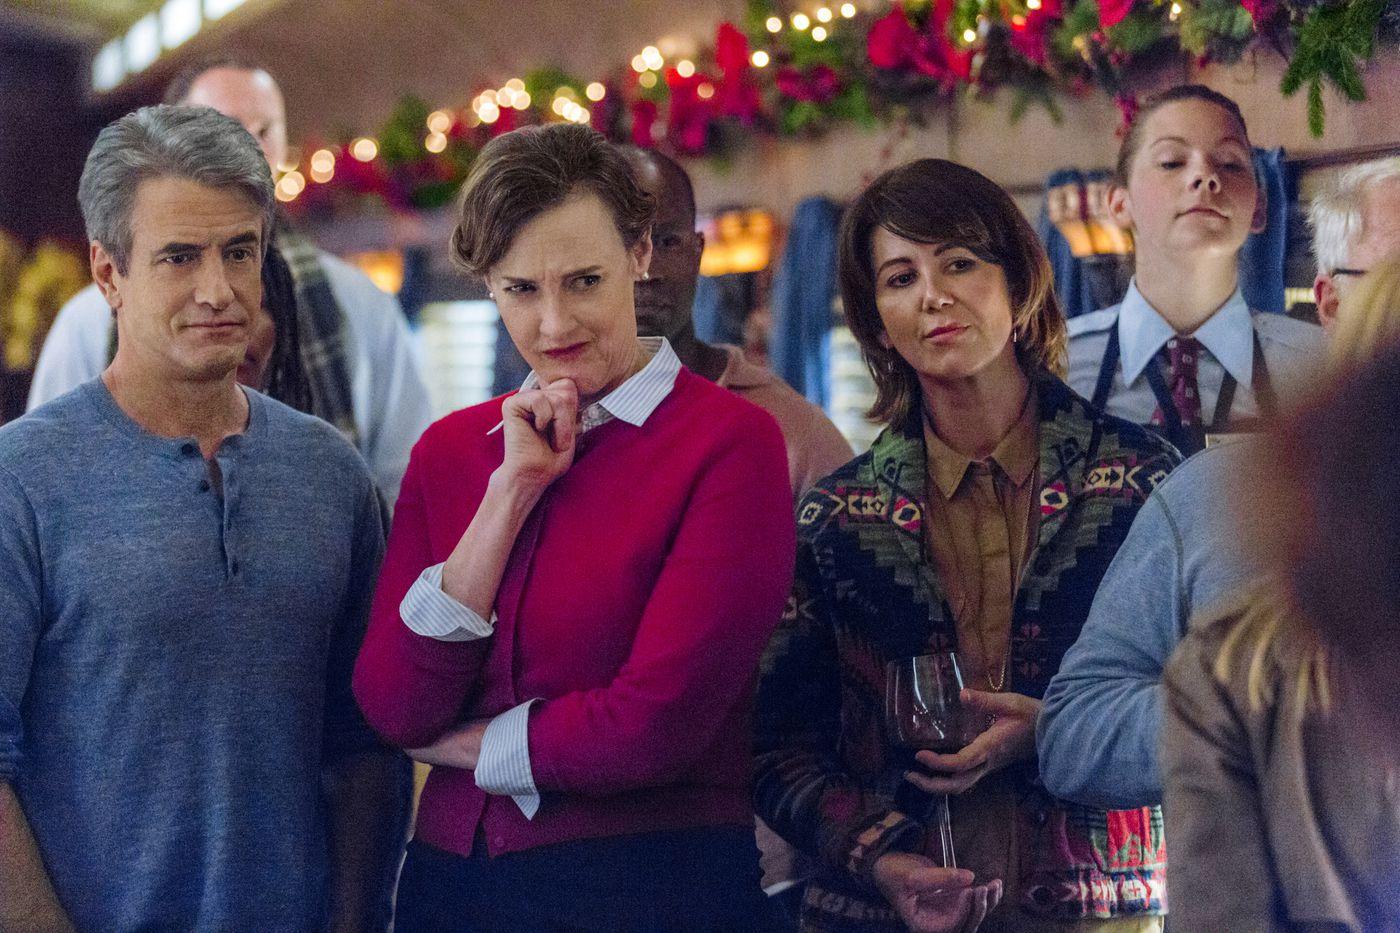 Entertaining Christmas Cast.Hallmark Christmas Movies Explained Vox